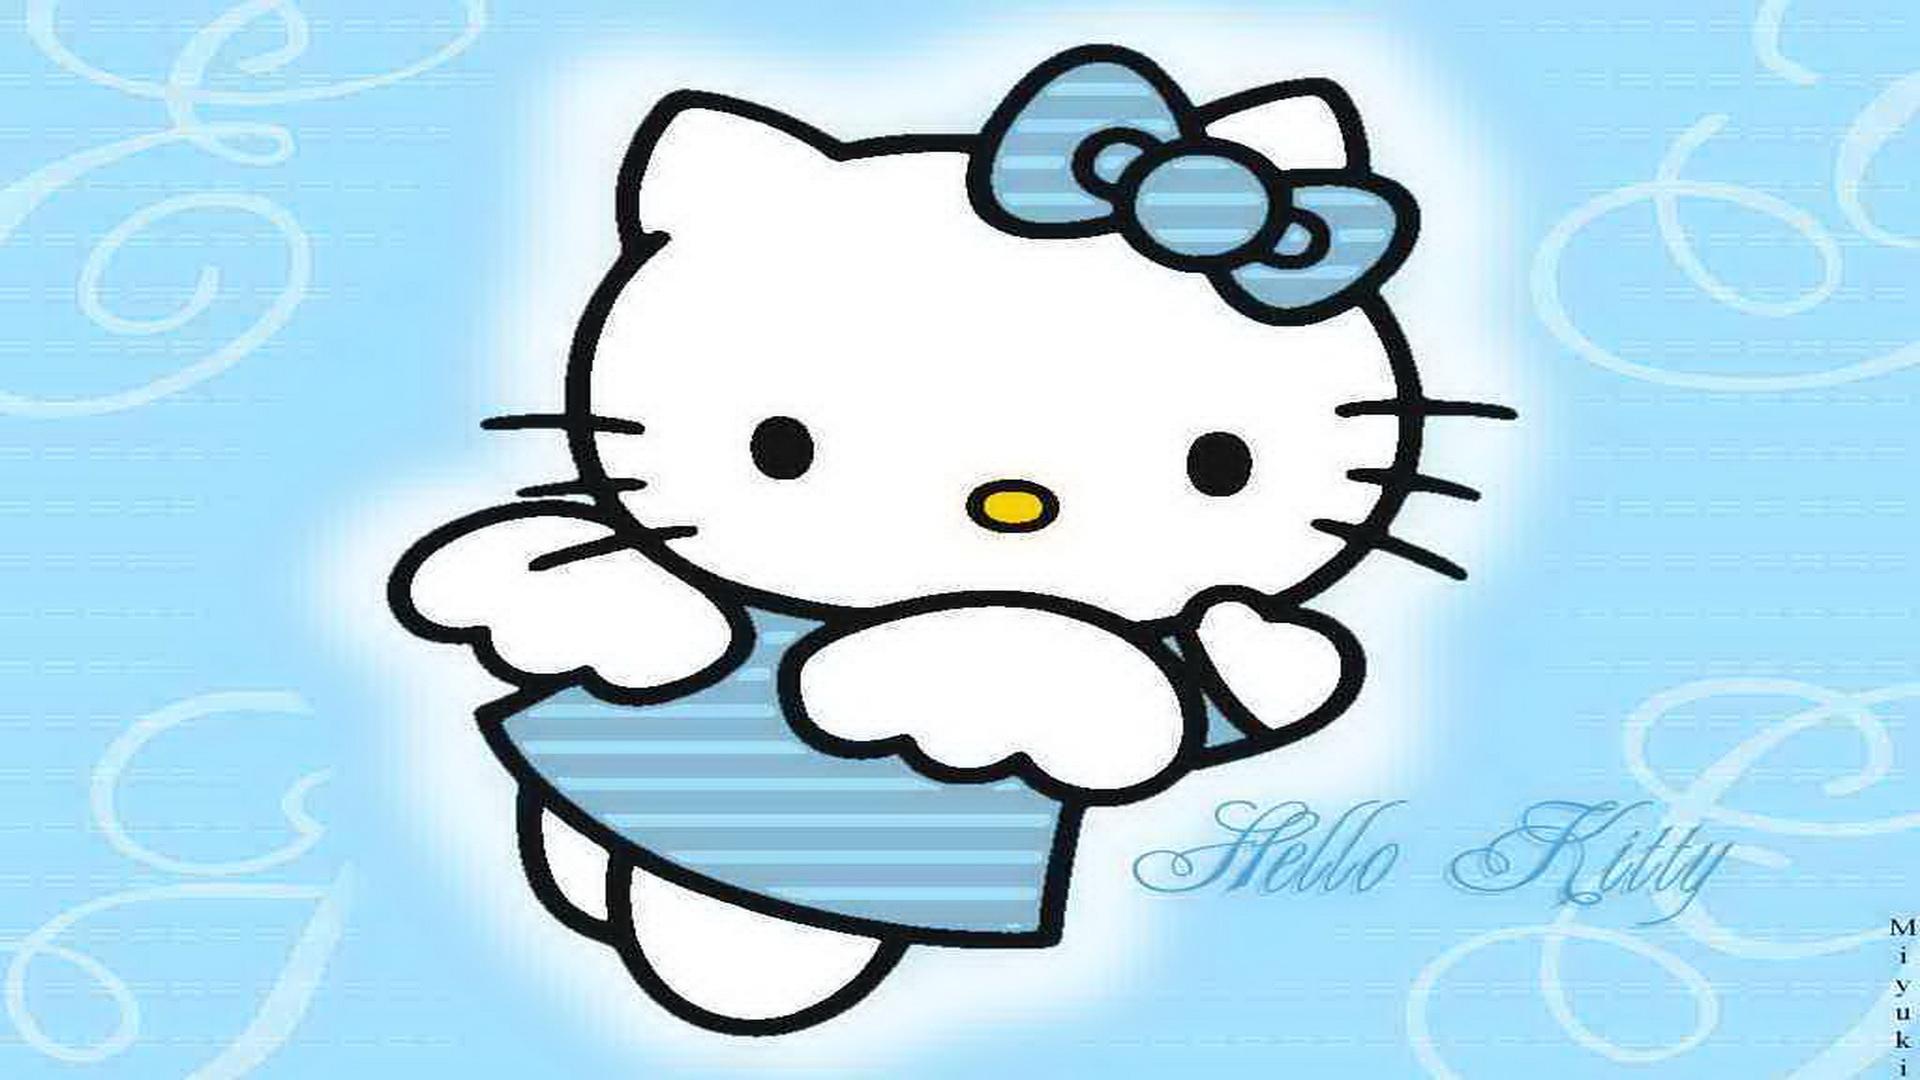 Hd Wallpapers Hello Kitty 1280 X 1024 636 Kb Jpeg HD Wallpapers 1920x1080